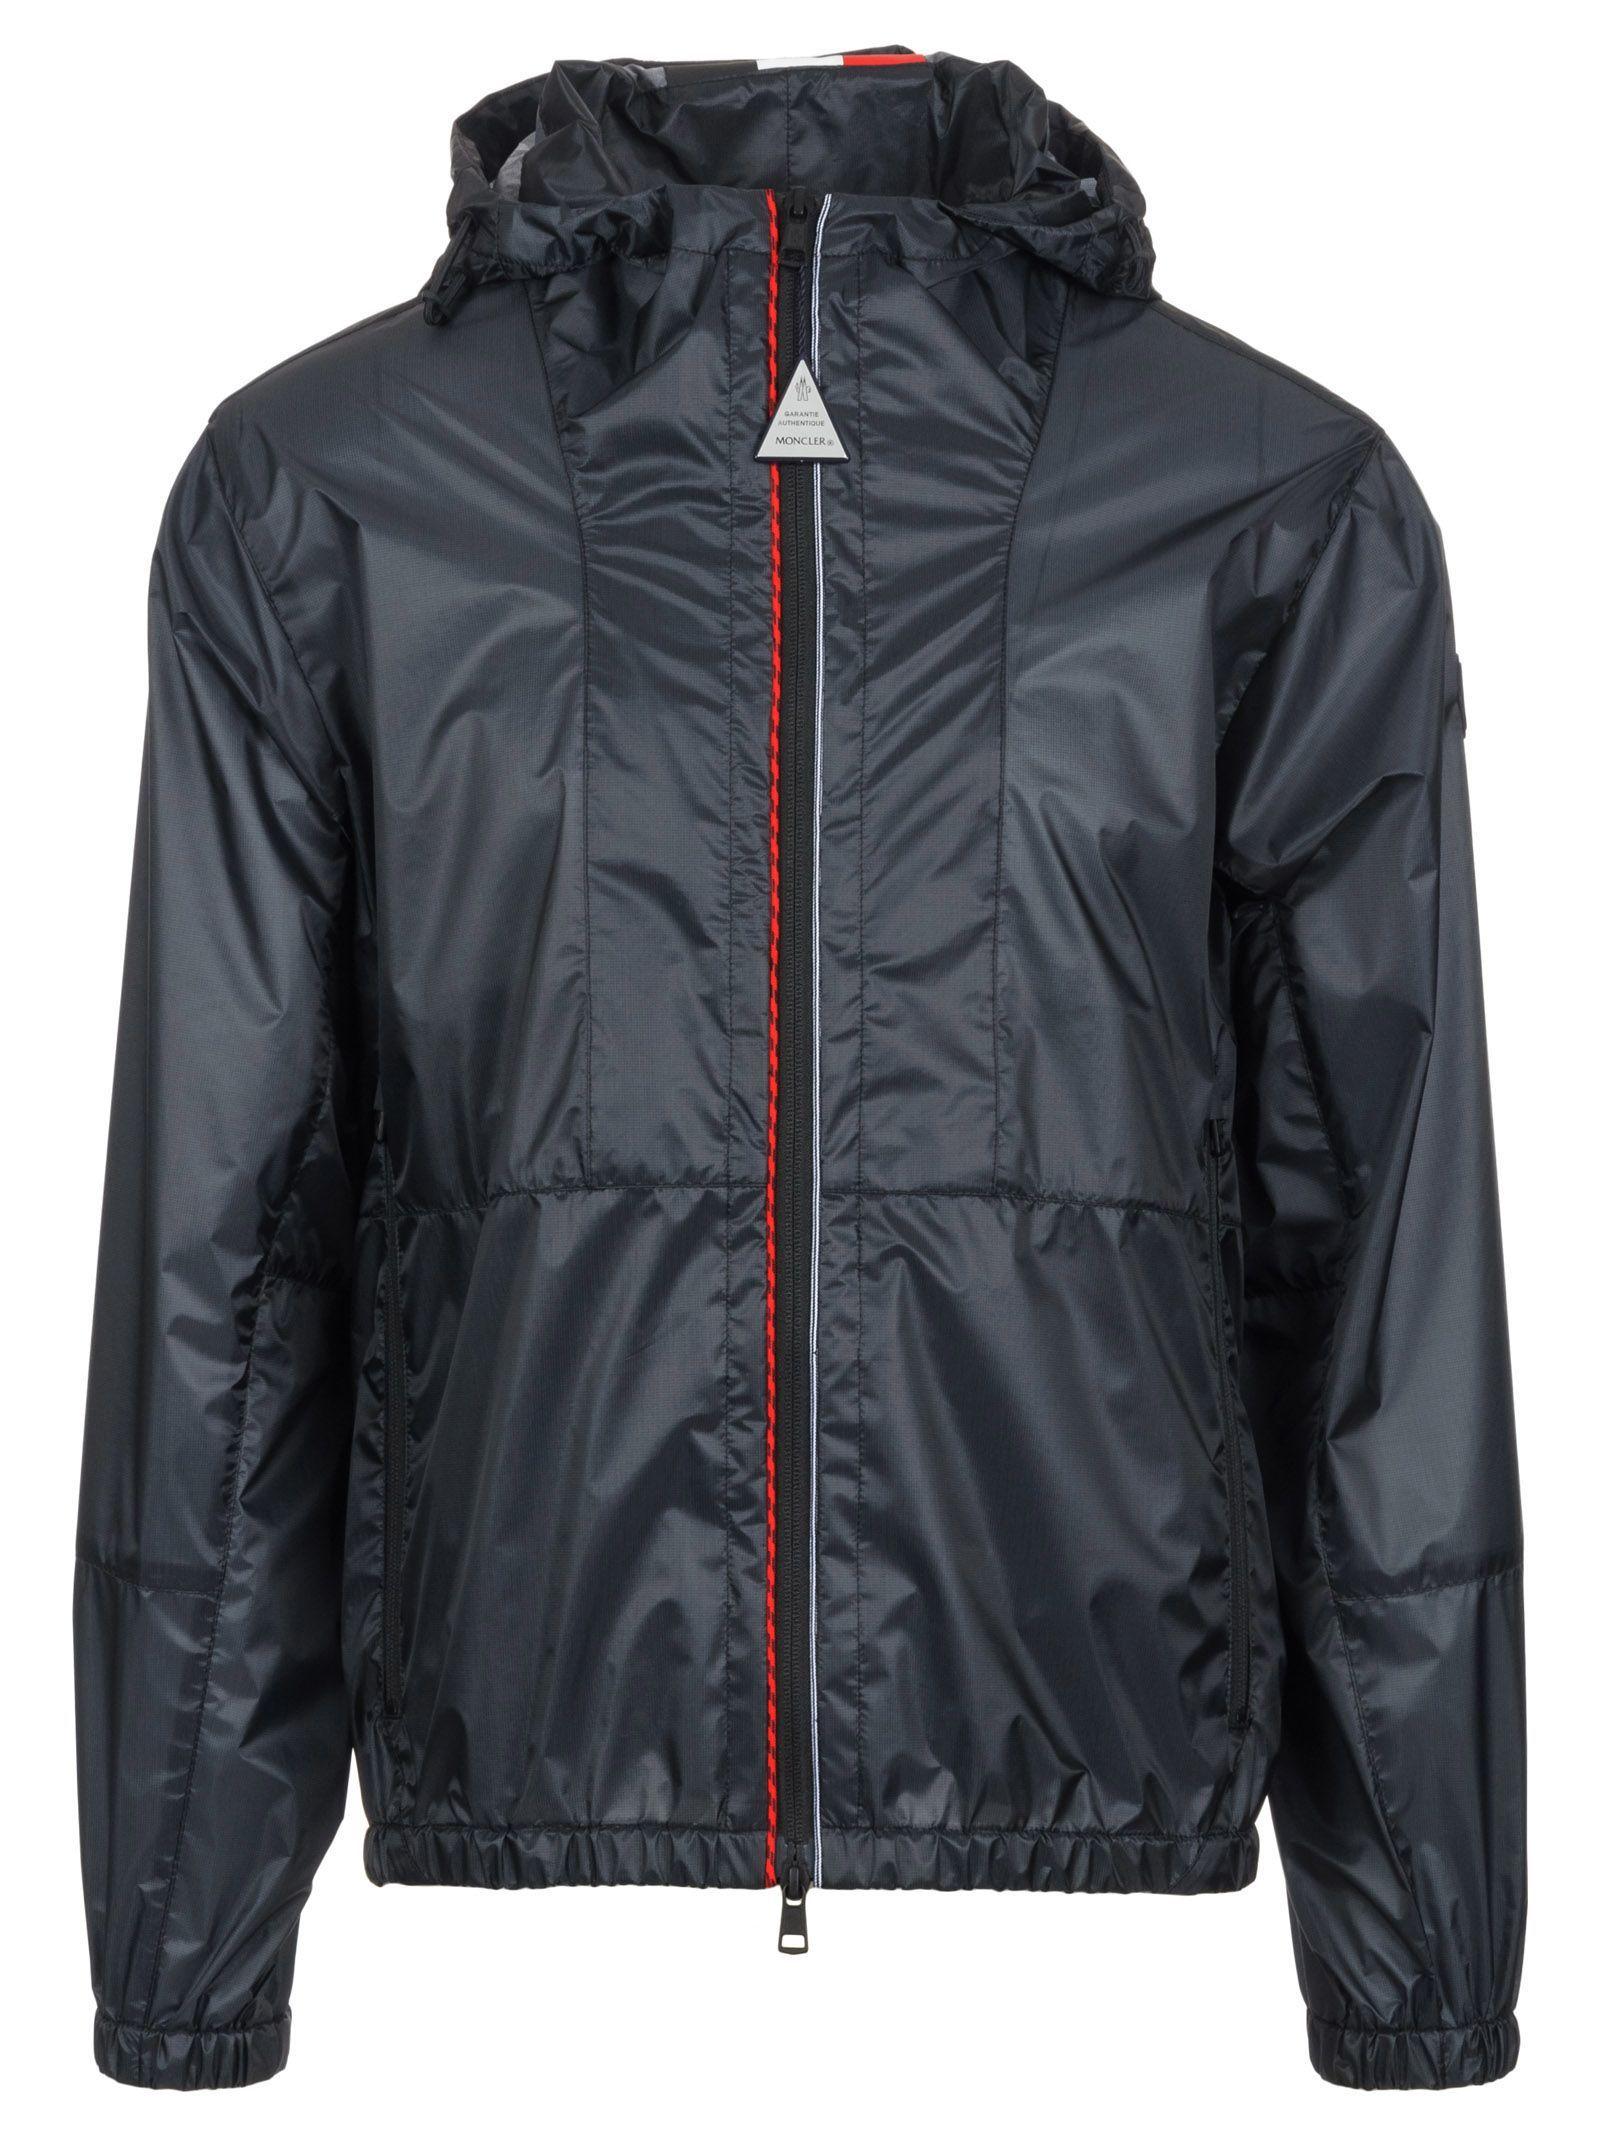 MONCLER AURIOL JACKET. moncler cloth Jackets, Moncler